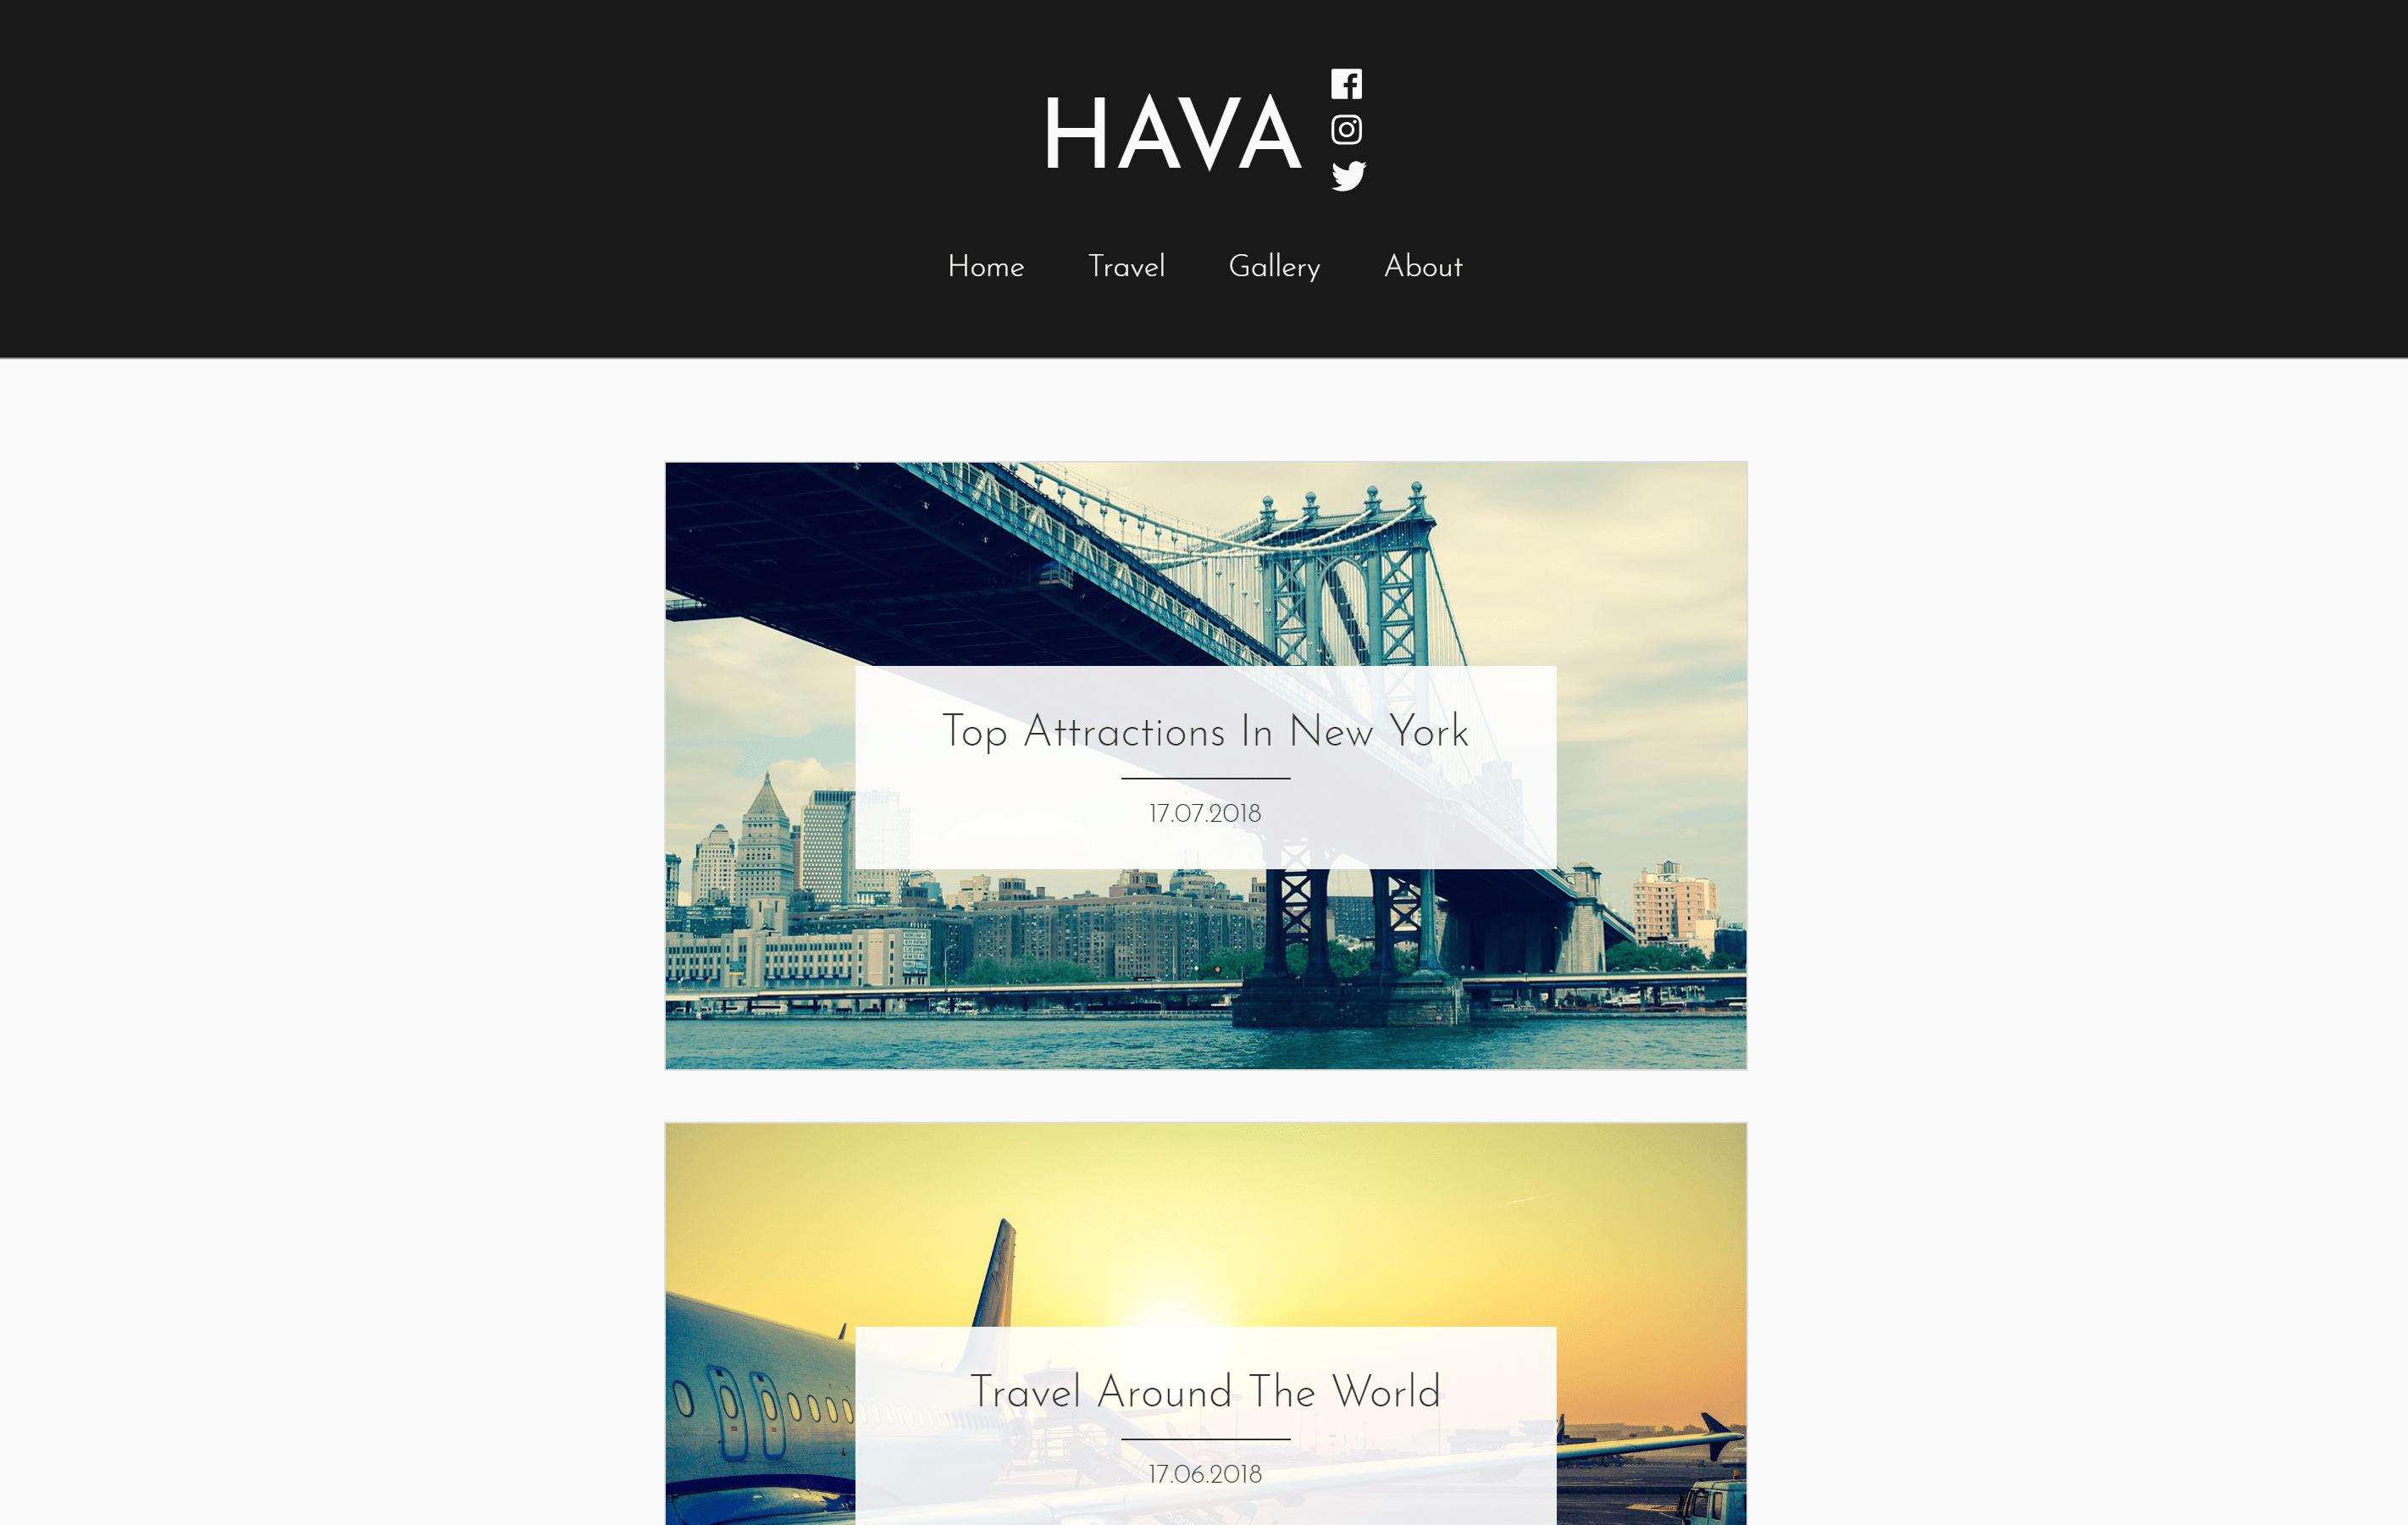 Download Hava 1.3 – Free WordPress Theme